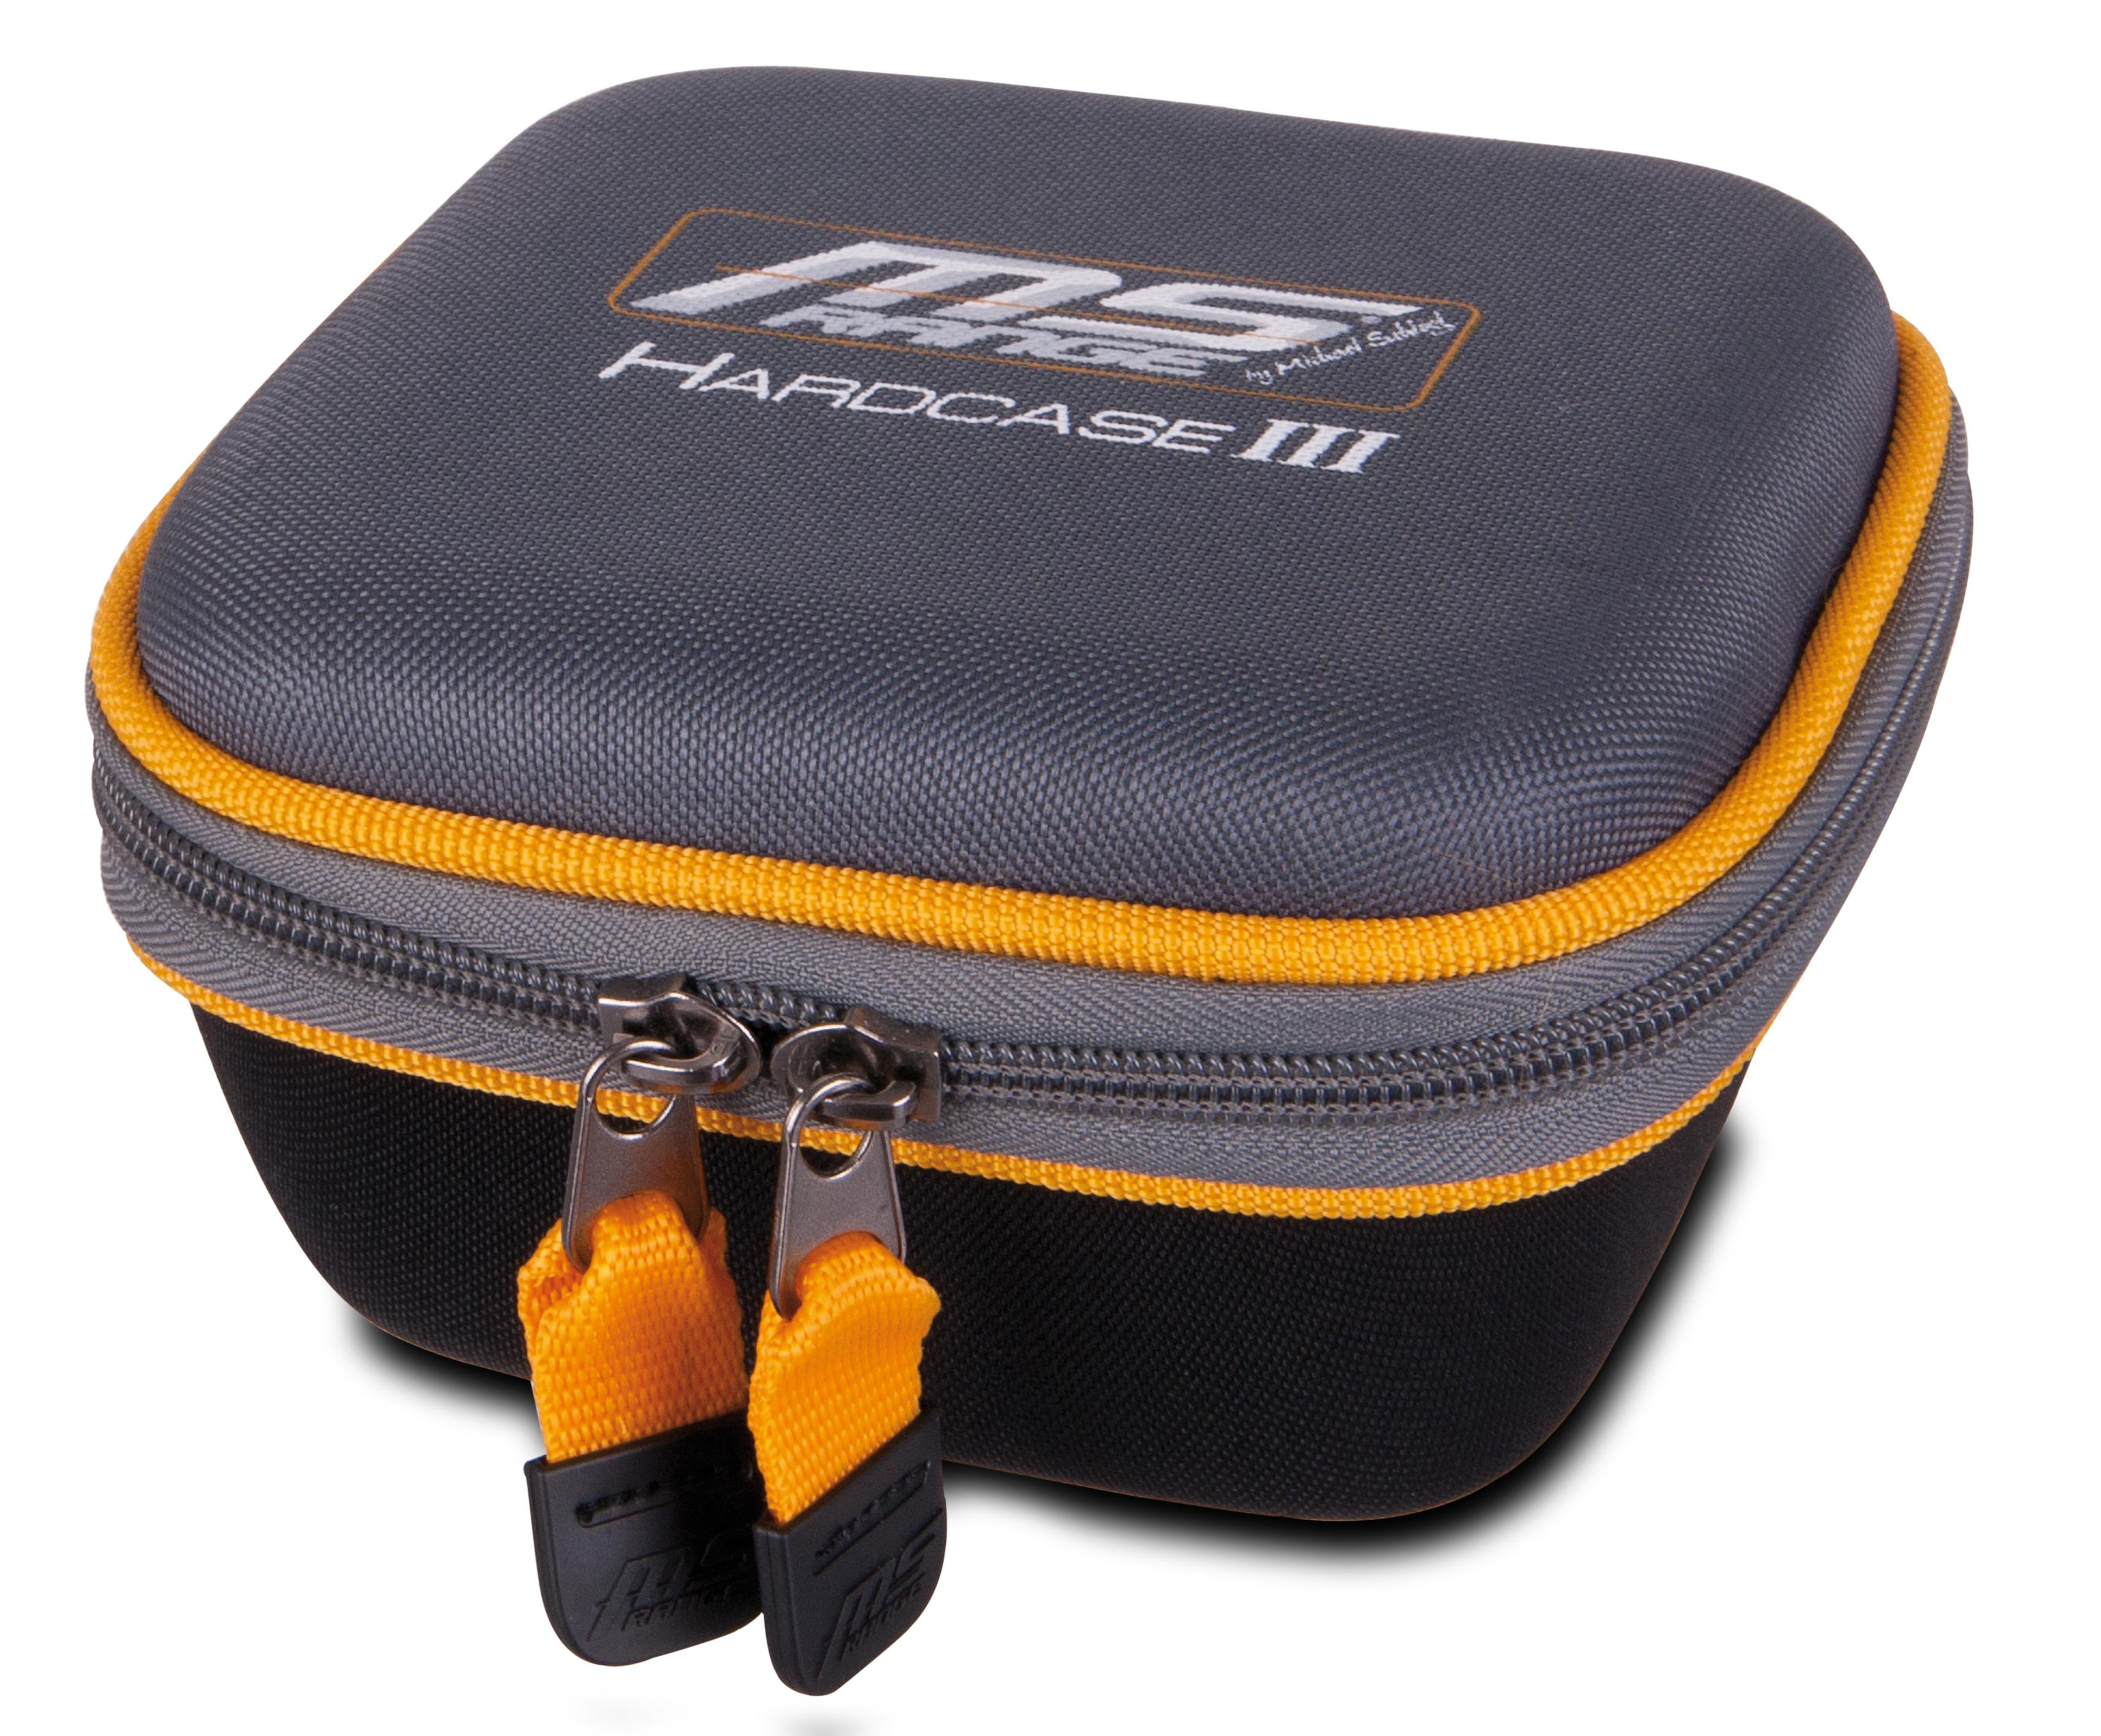 Pouzdro MS Range Hardcase Series varianta: III